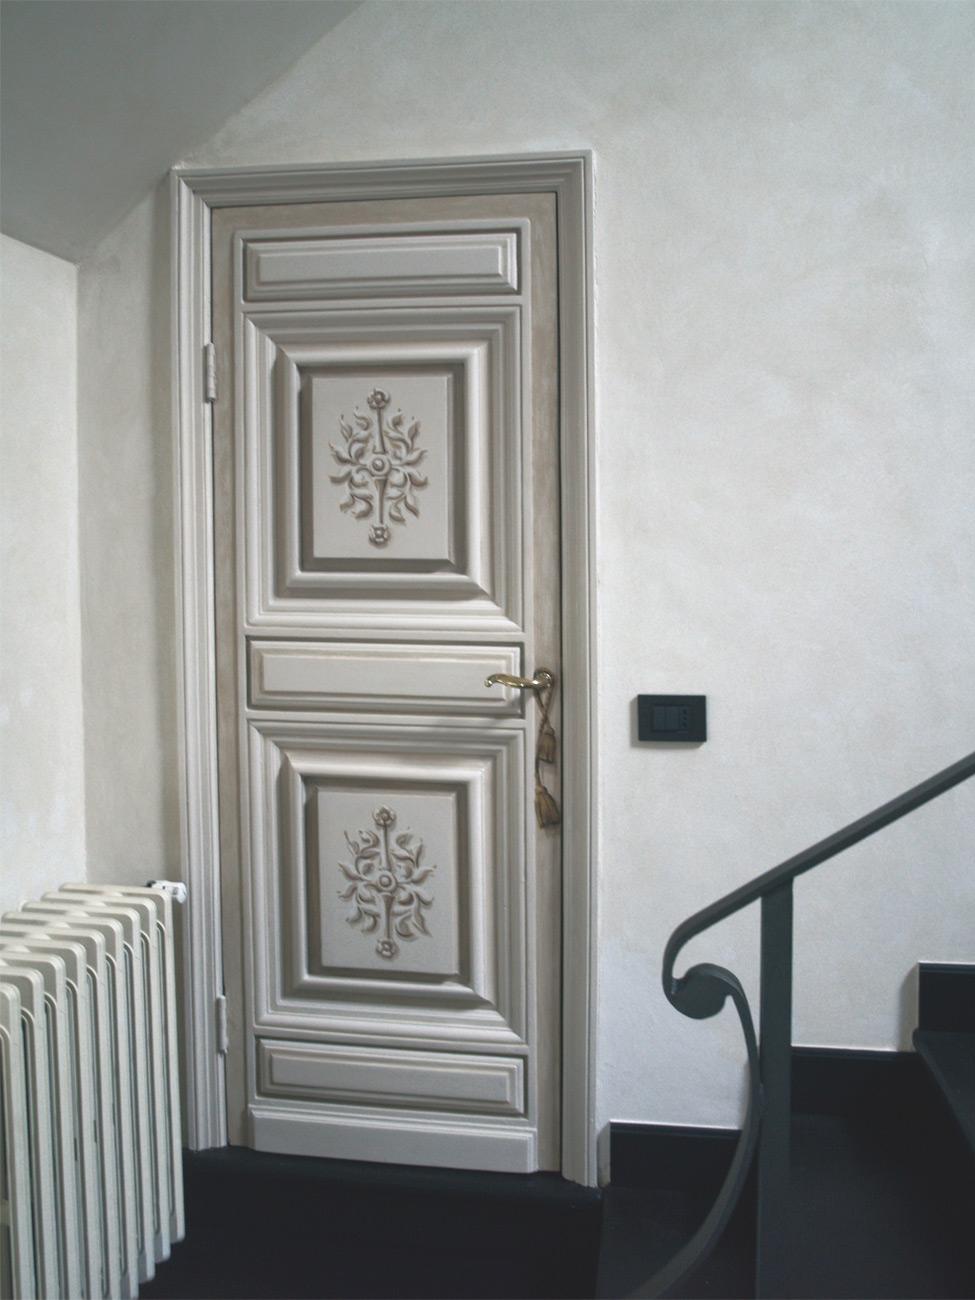 Mara beccaris complementi d arredo e mobili for Complementi d arredo stravaganti